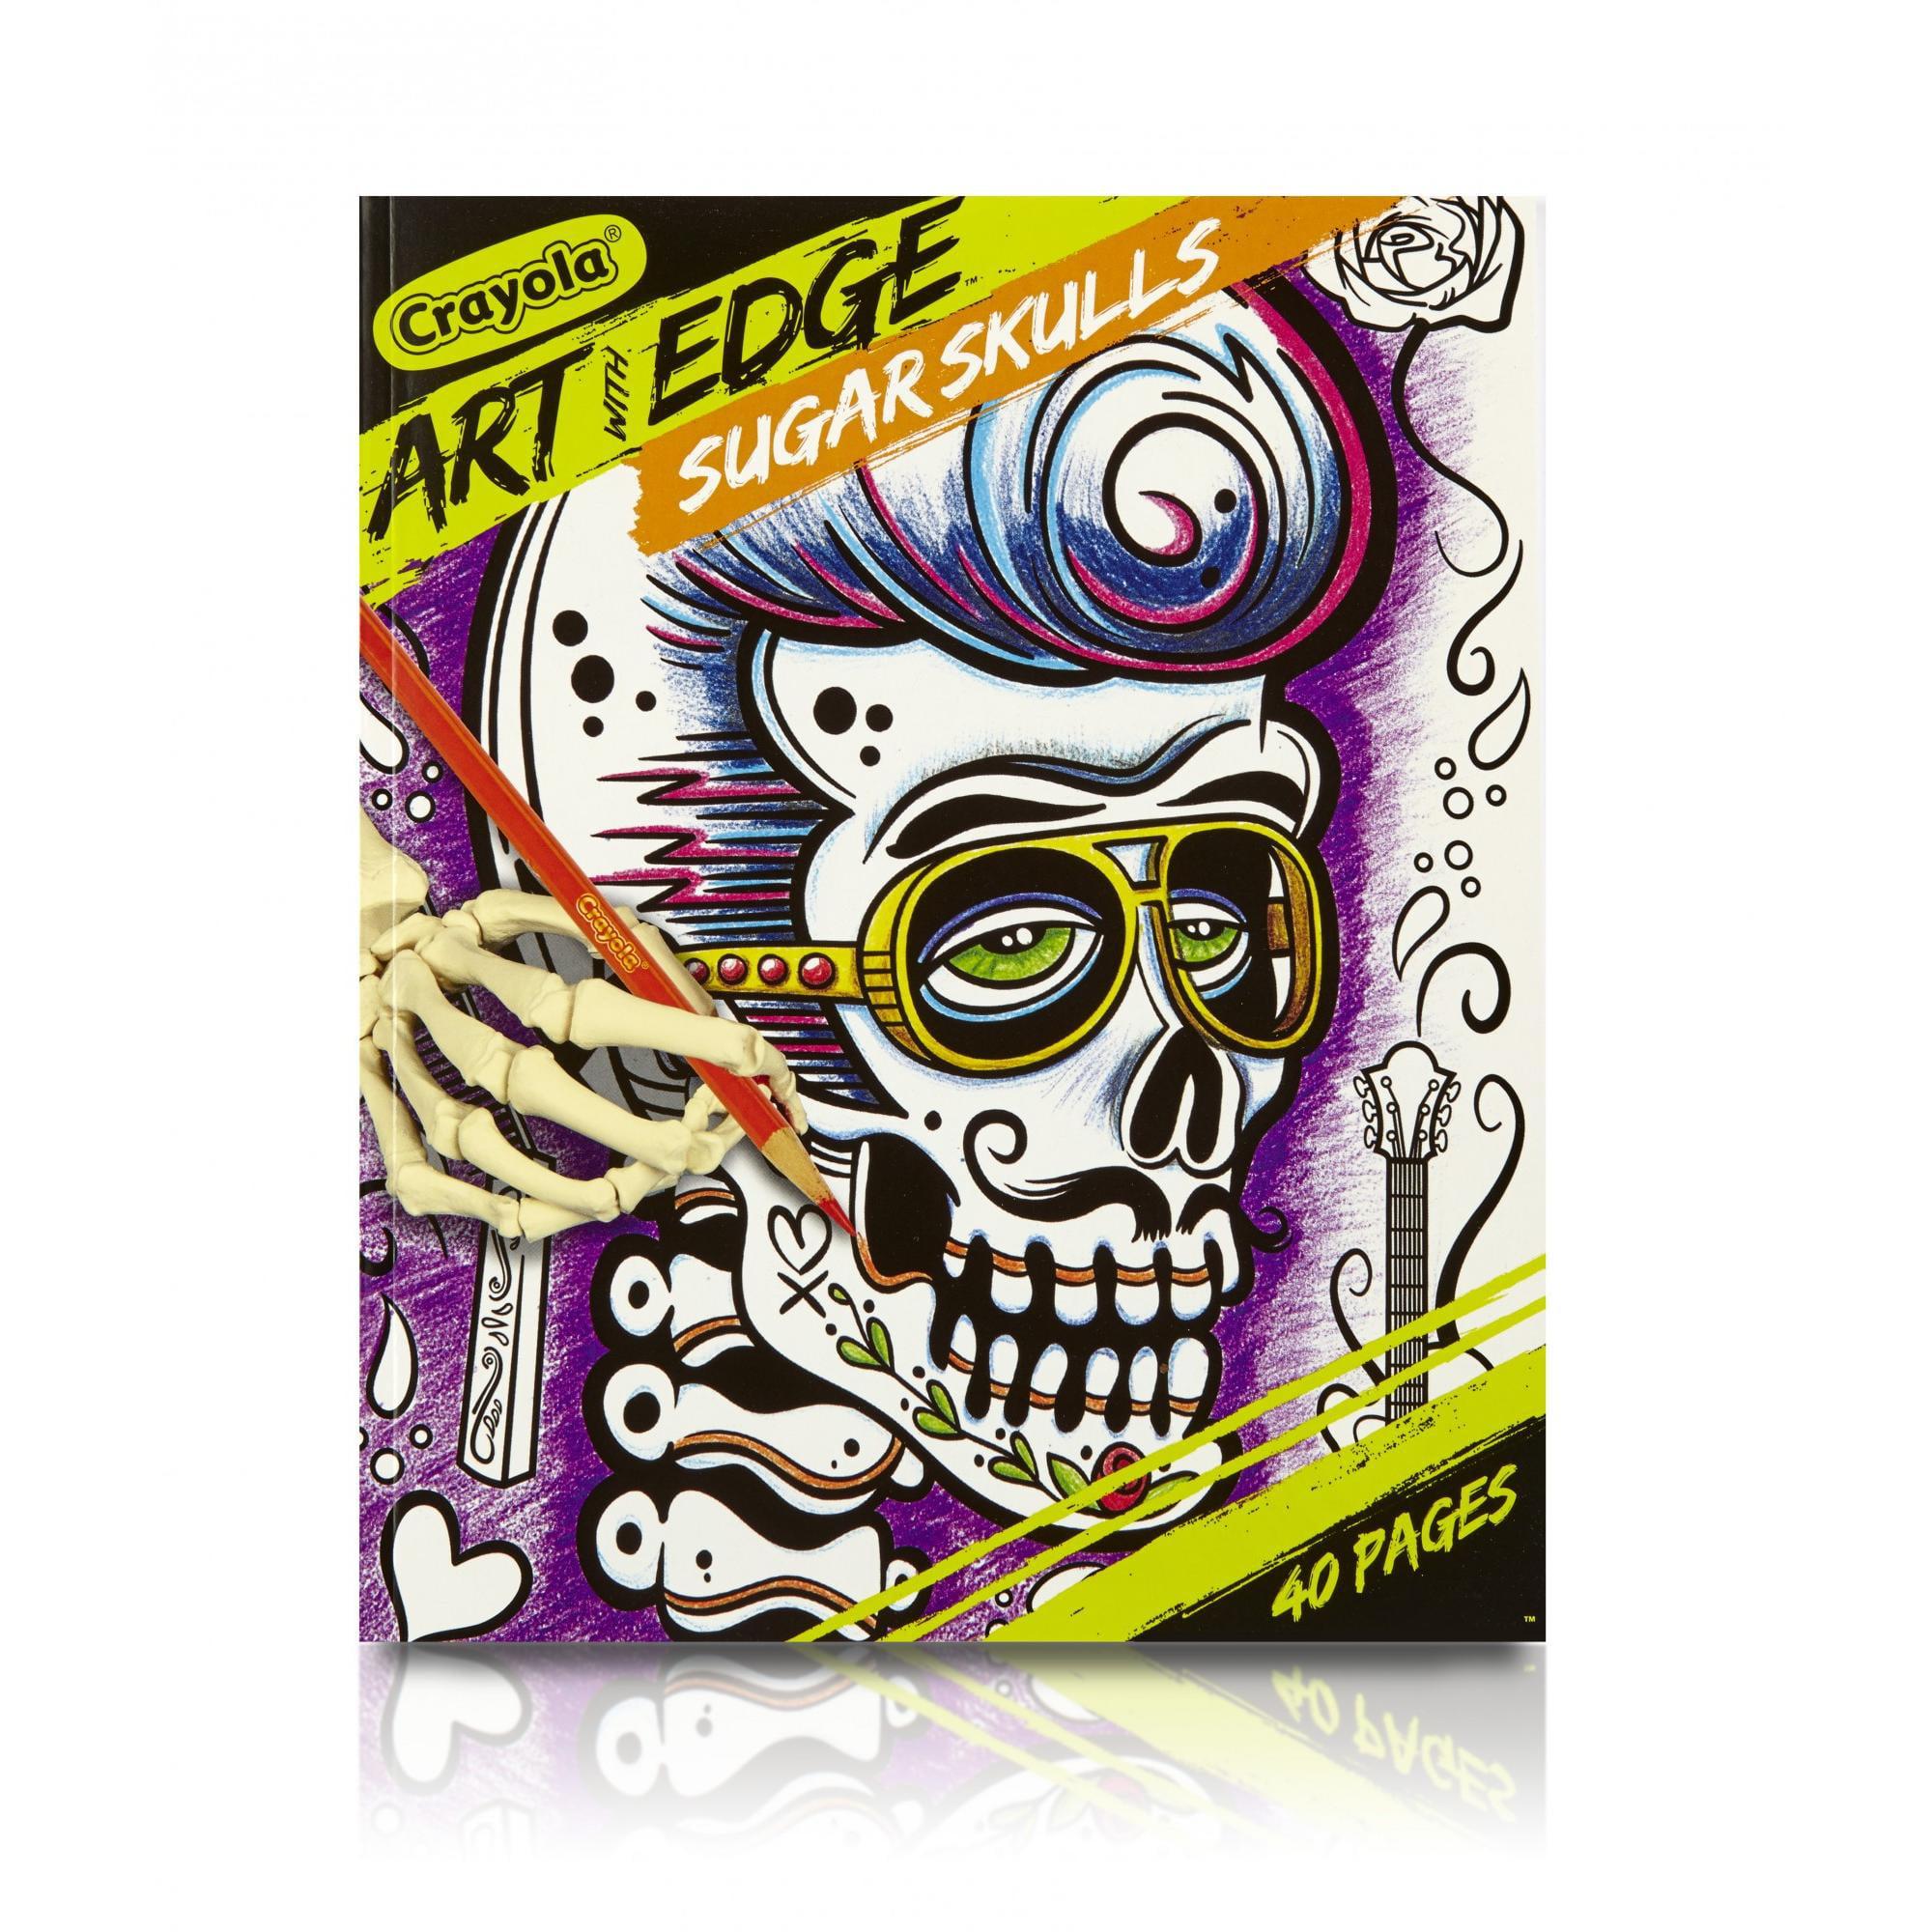 Crayola Sugar Skulls Coloring Book, Teen Coloring, 40 Pages